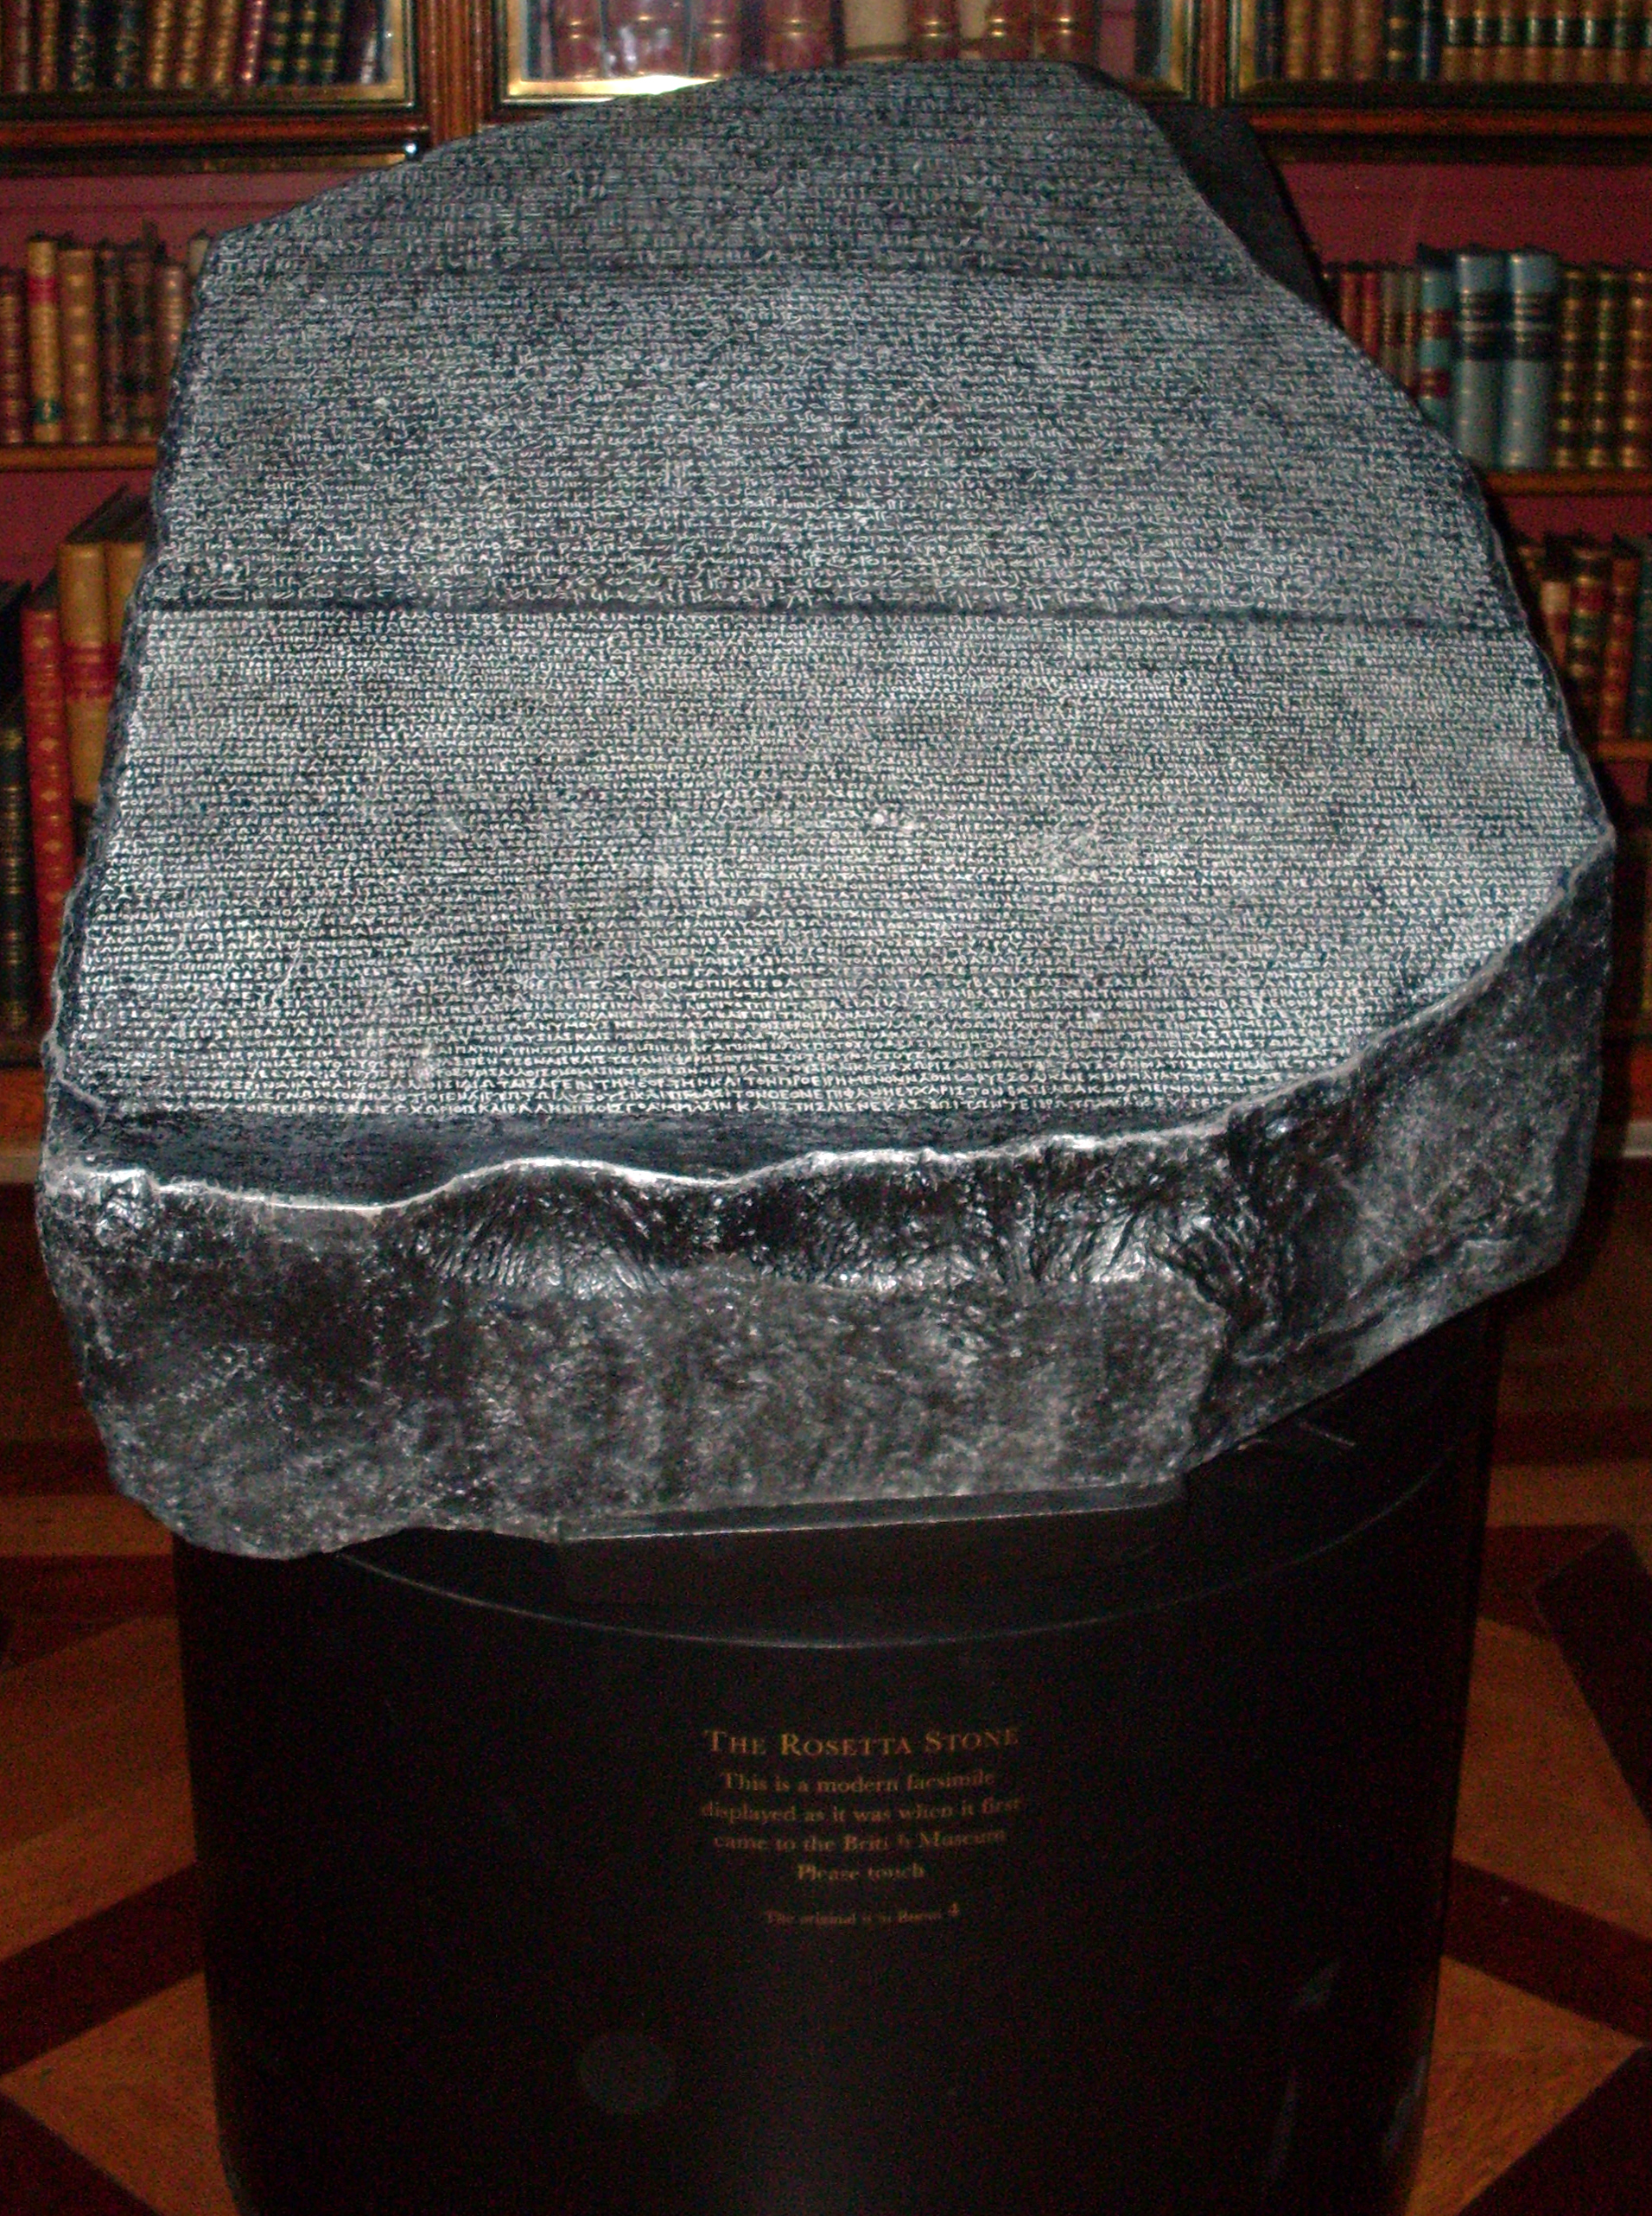 http://upload.wikimedia.org/wikipedia/commons/c/c3/Copy_of_Rosetta_Stone.jpg